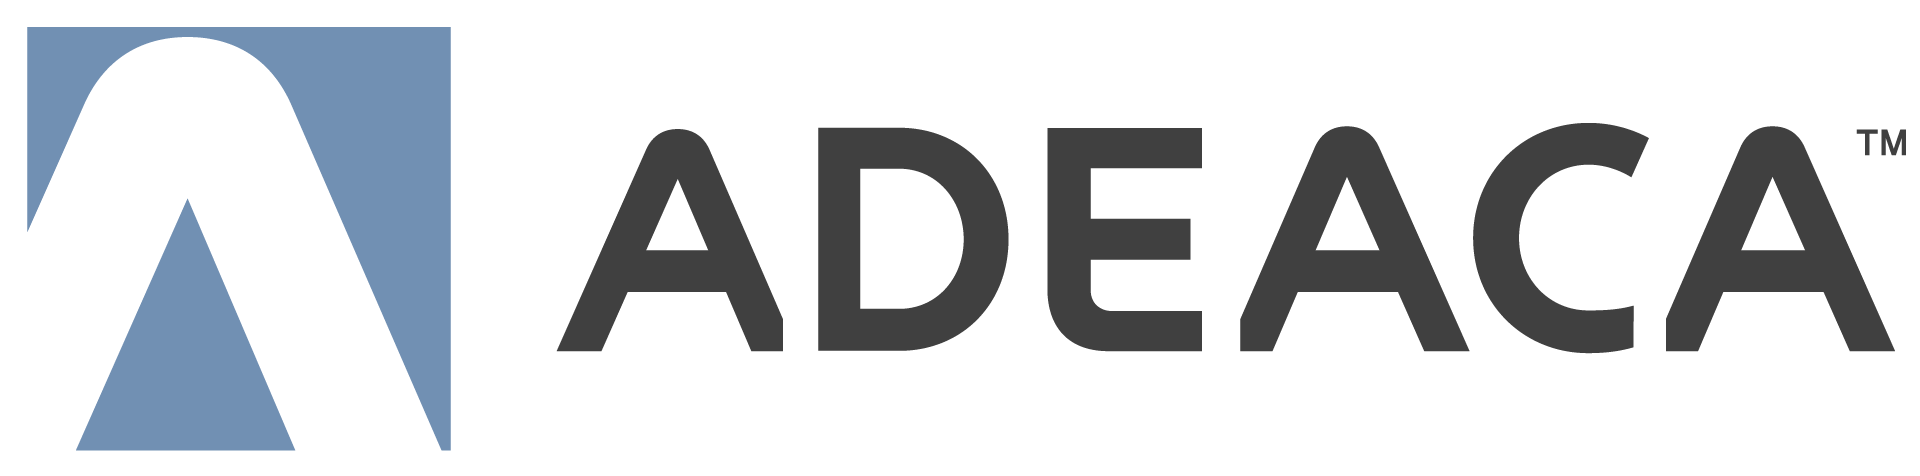 Matt Mong of ADEACA Featured on Manufacturing Talk Radio Podcast